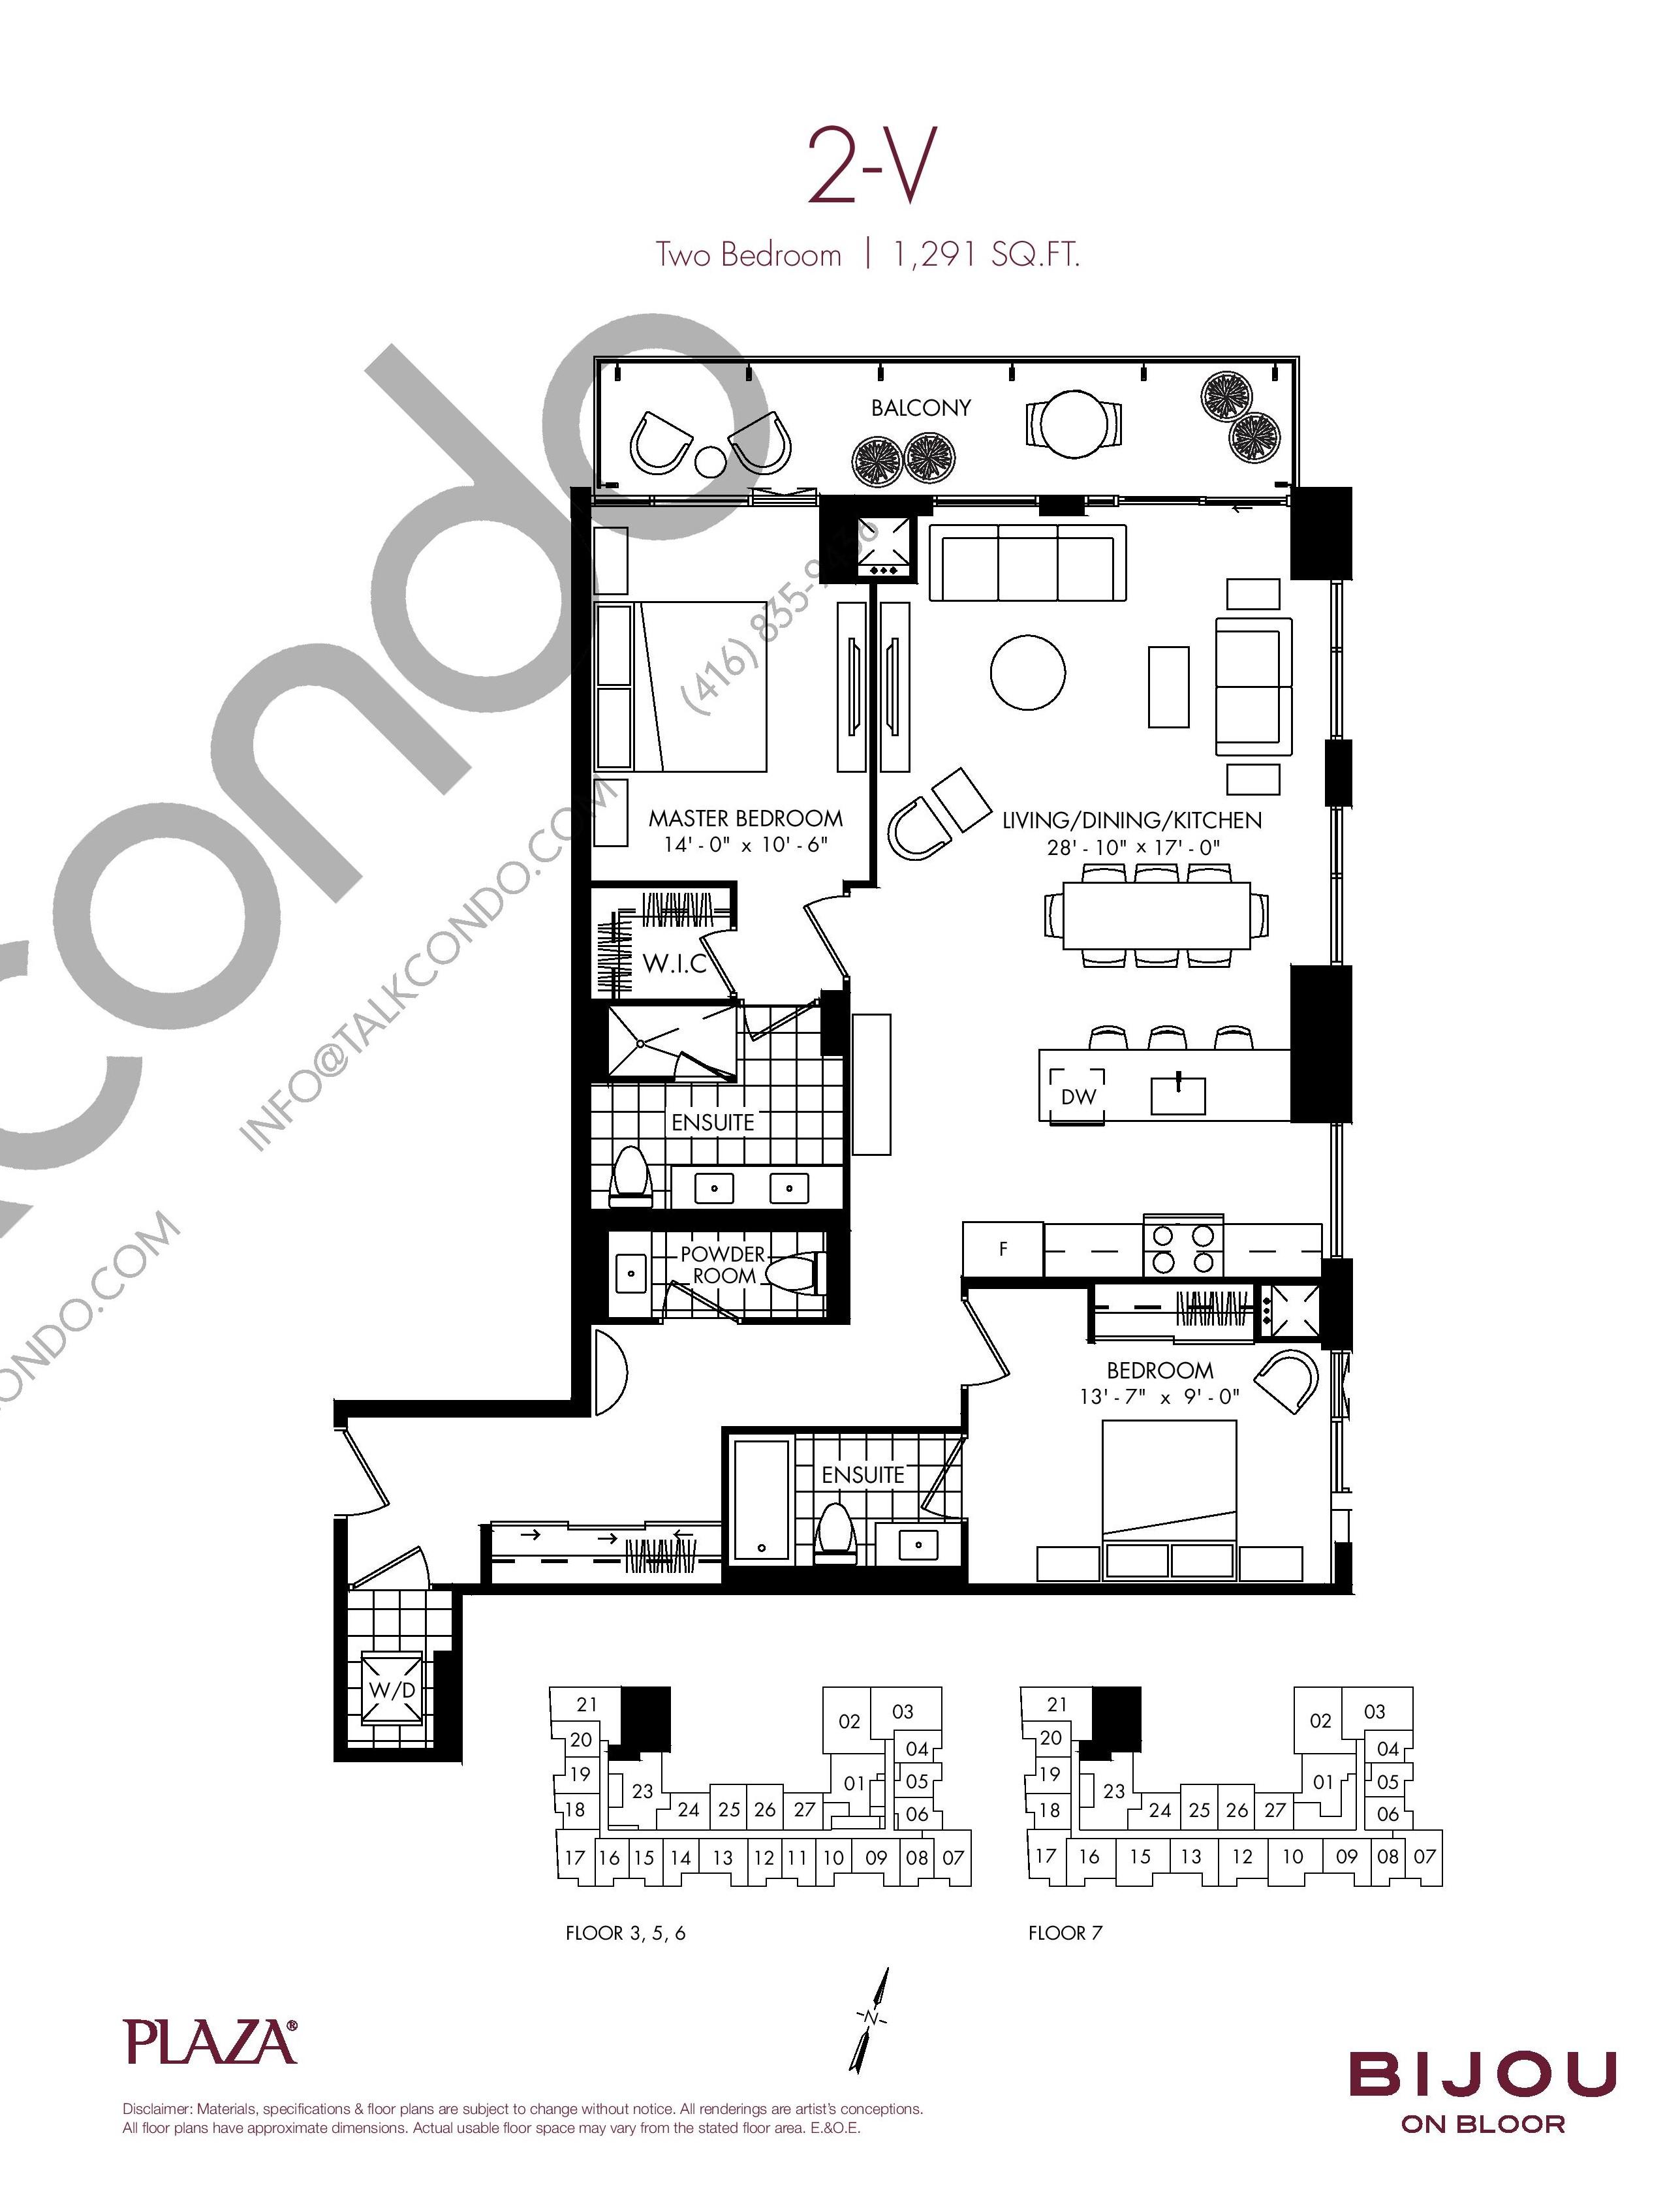 2-V Floor Plan at Bijou On Bloor Condos - 1291 sq.ft